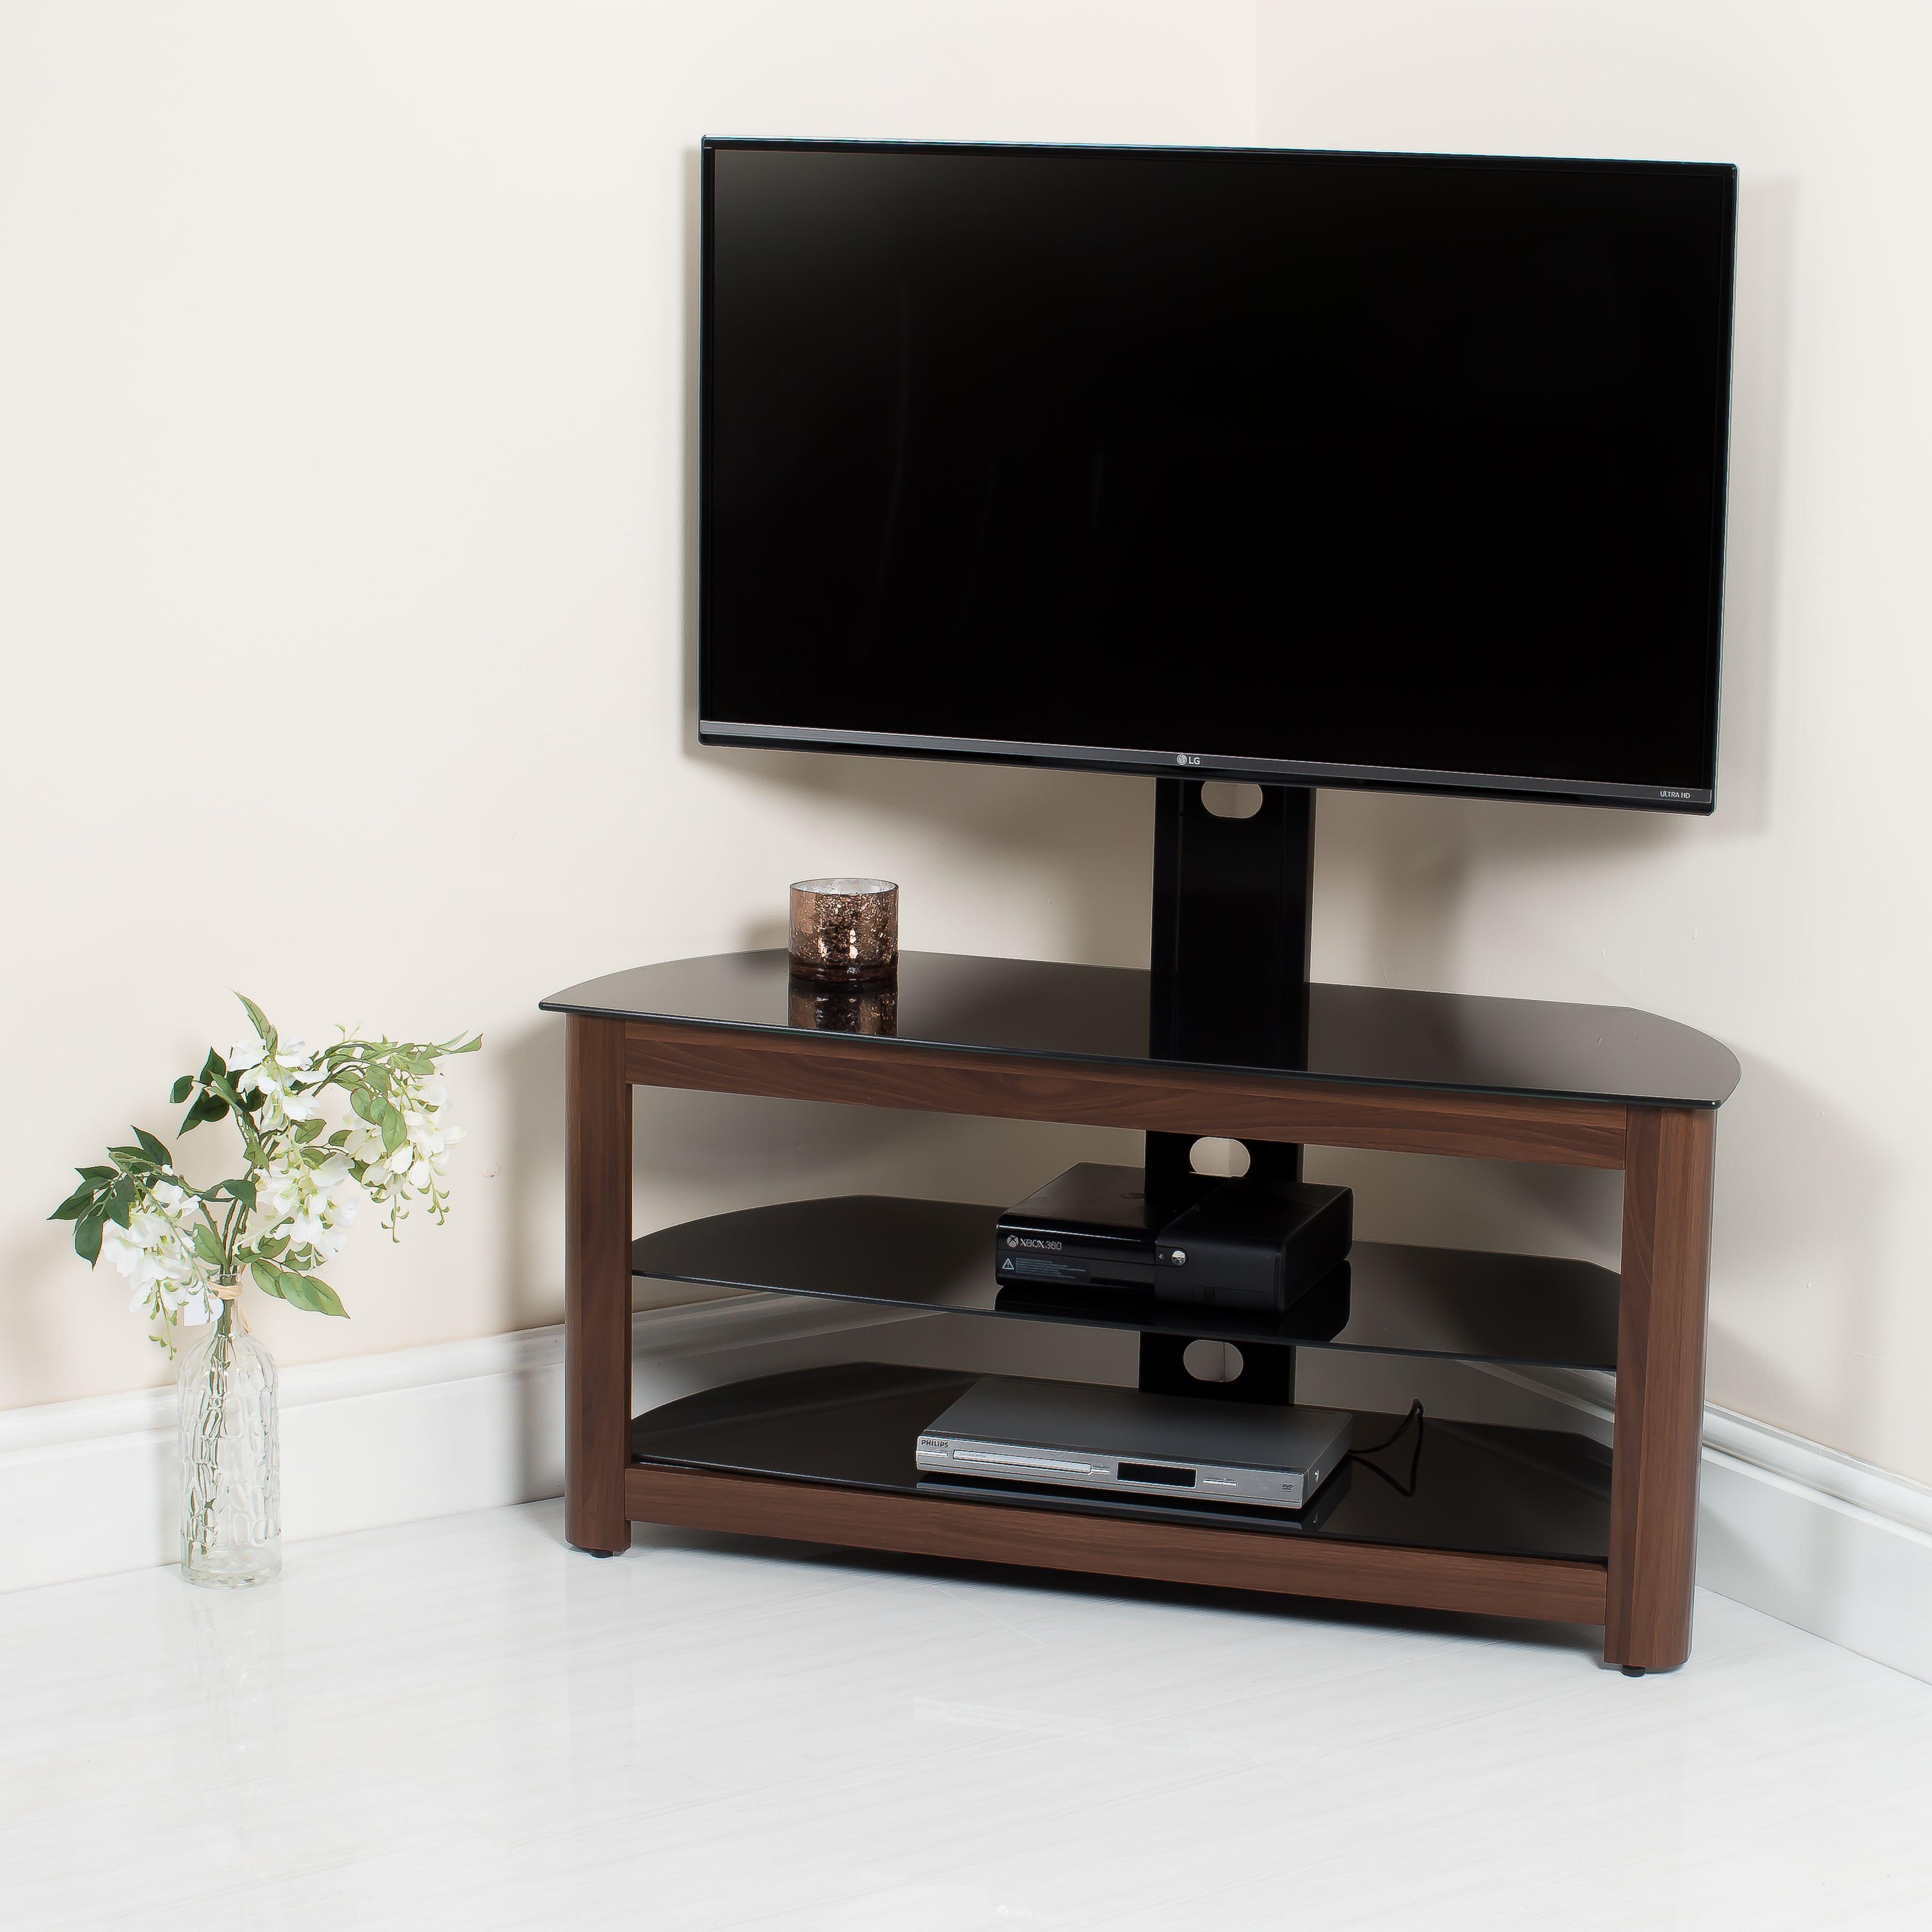 Walnut Framed TV Stand http//abreo.co.uk/ Modern Gloss